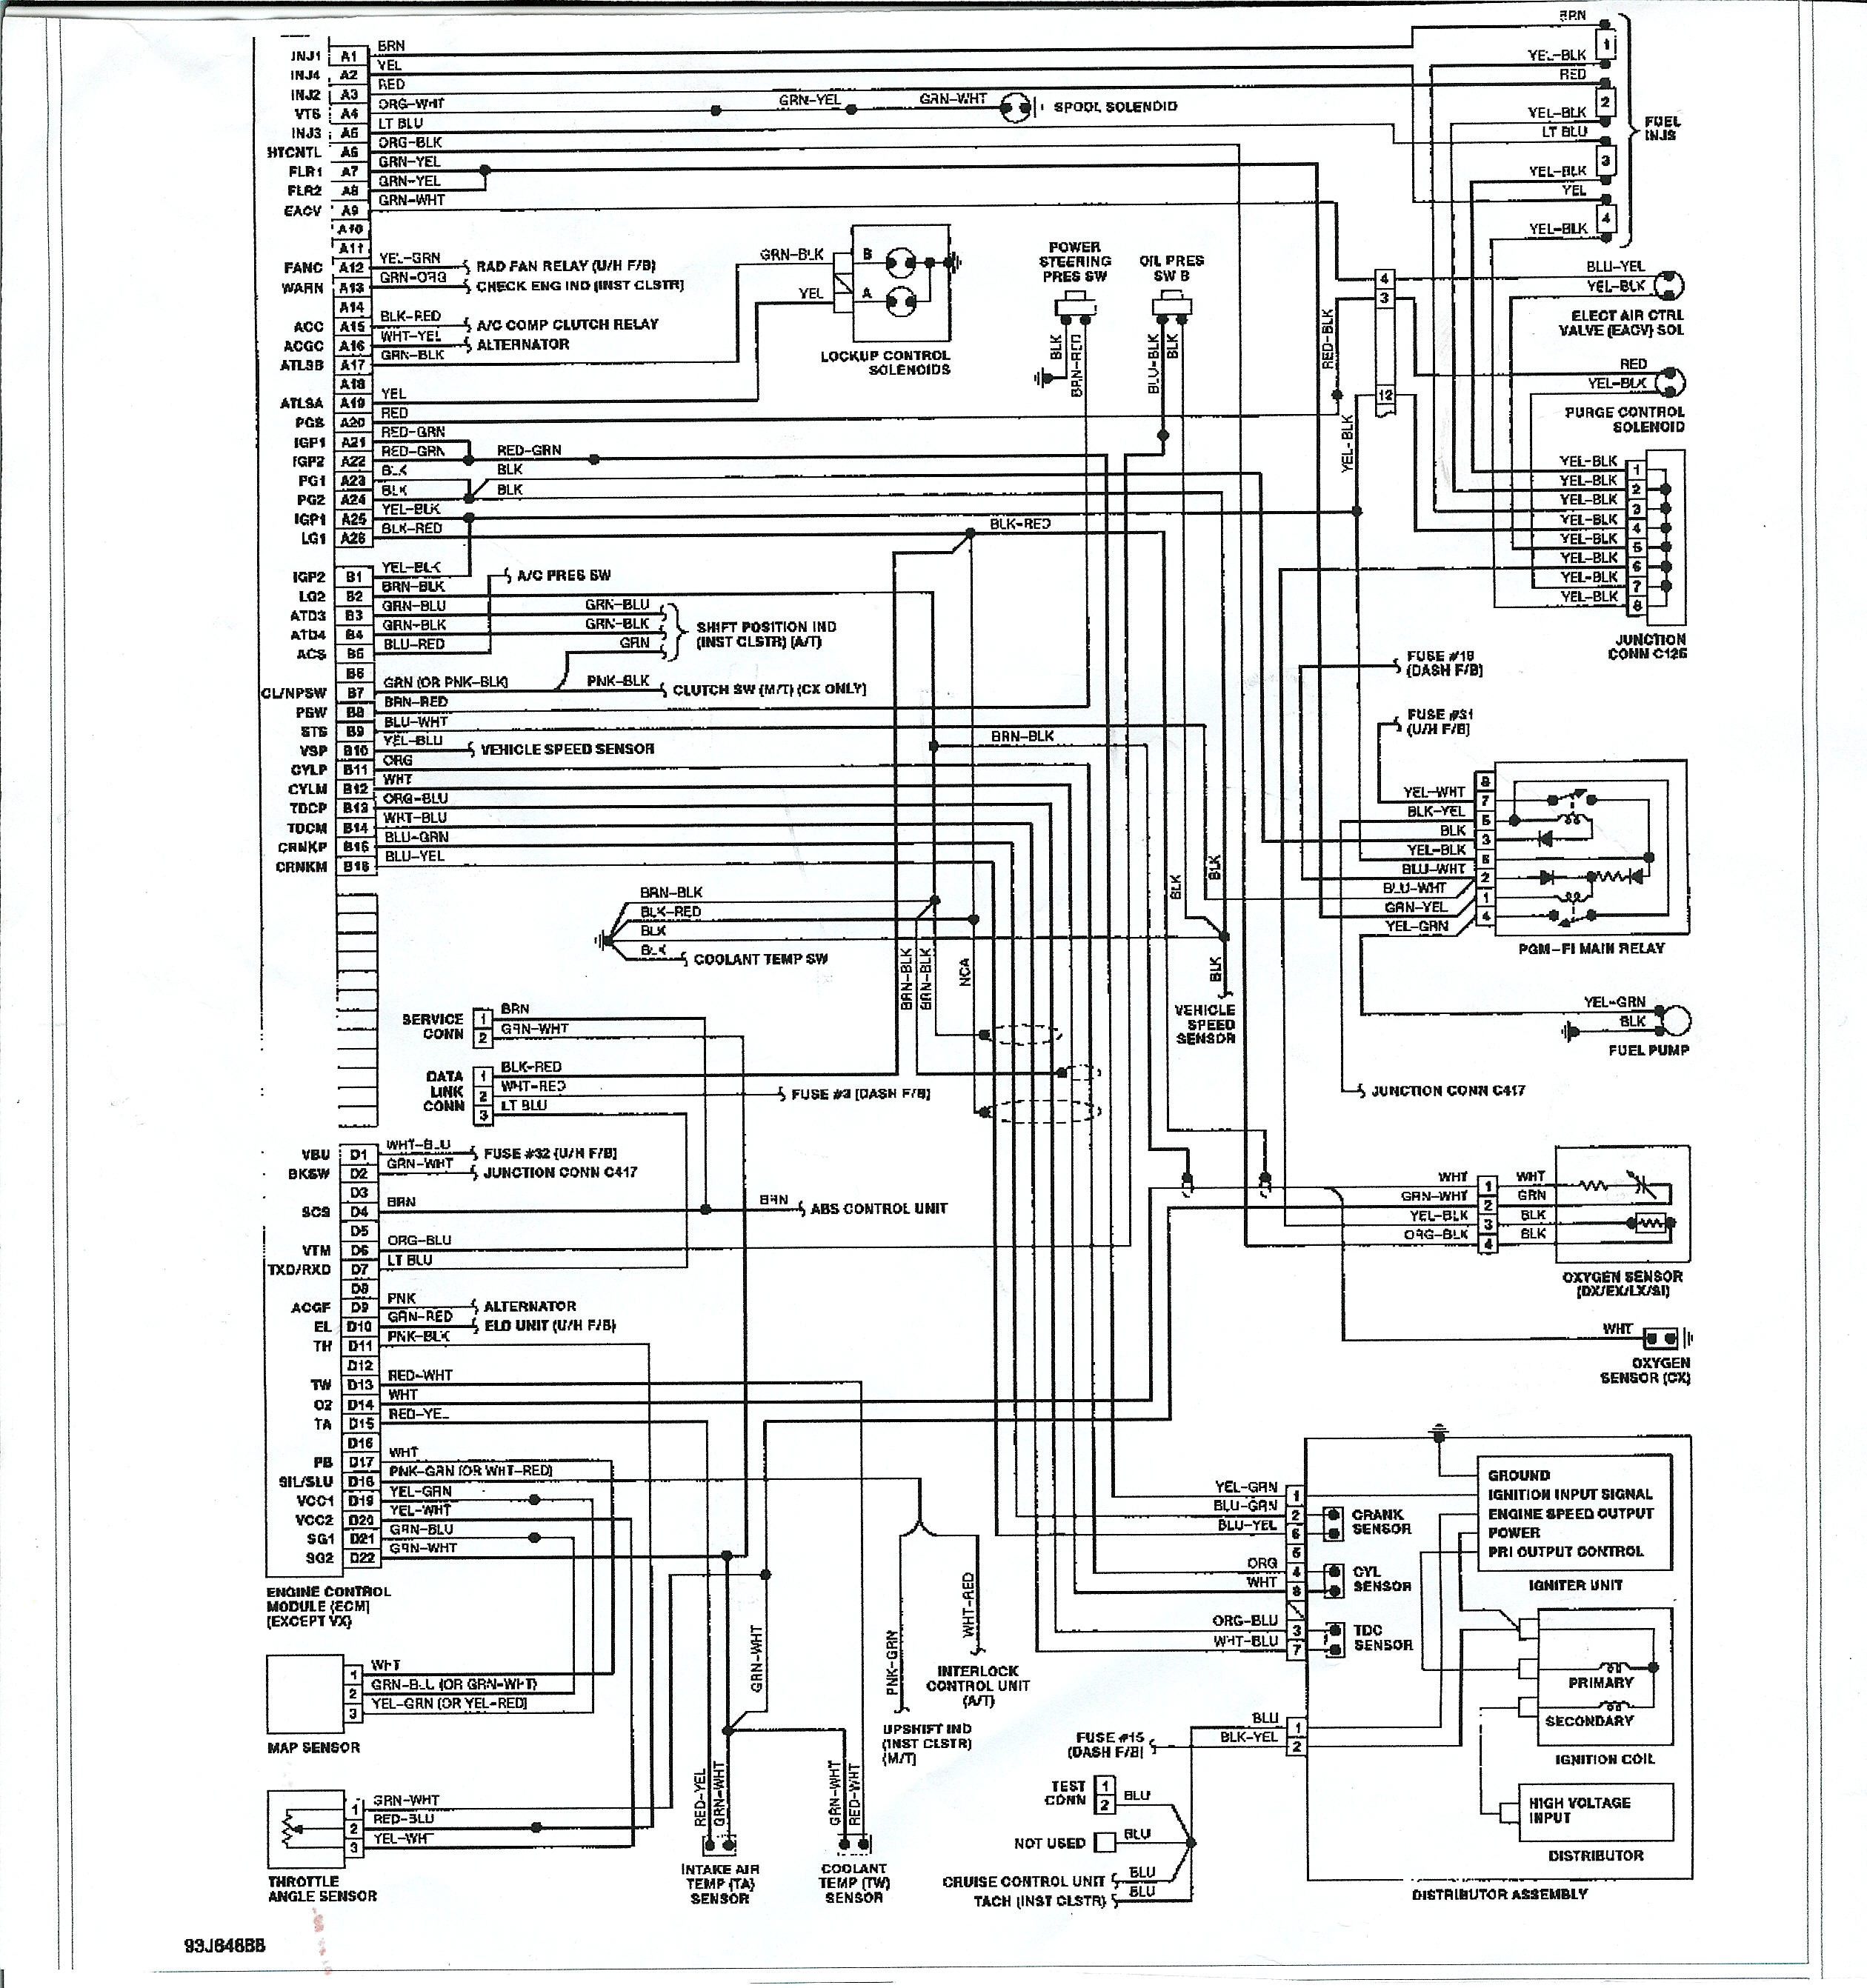 Bmw X5 Radio Wiring Diagram Further Bmw Radio Wiring Diagram Wiring